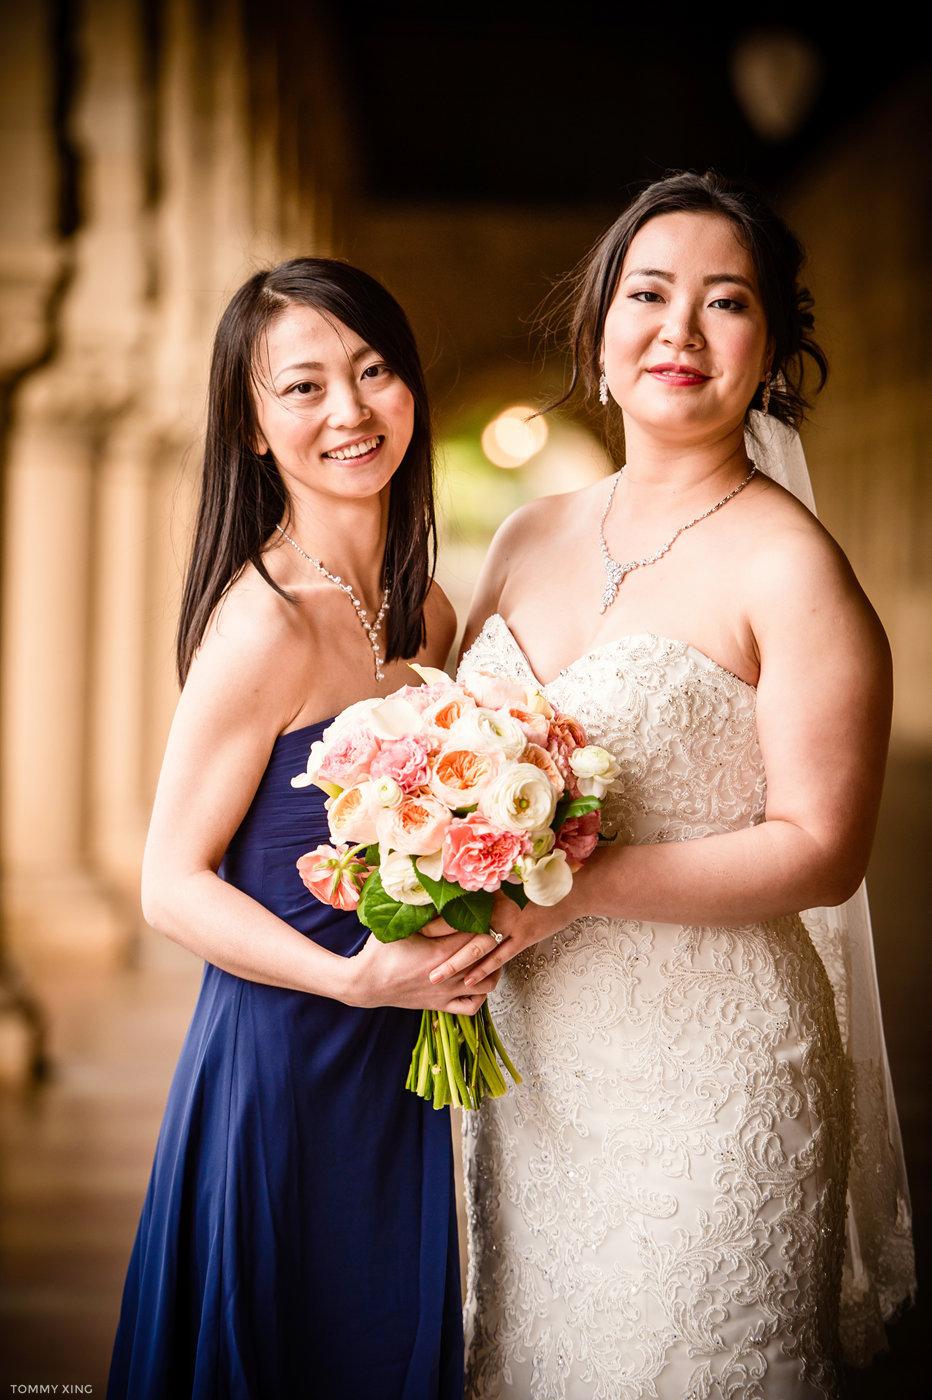 STANFORD MEMORIAL CHURCH WEDDING - Wenjie & Chengcheng - SAN FRANCISCO BAY AREA 斯坦福教堂婚礼跟拍 - 洛杉矶婚礼婚纱照摄影师 Tommy Xing Photography144.jpg